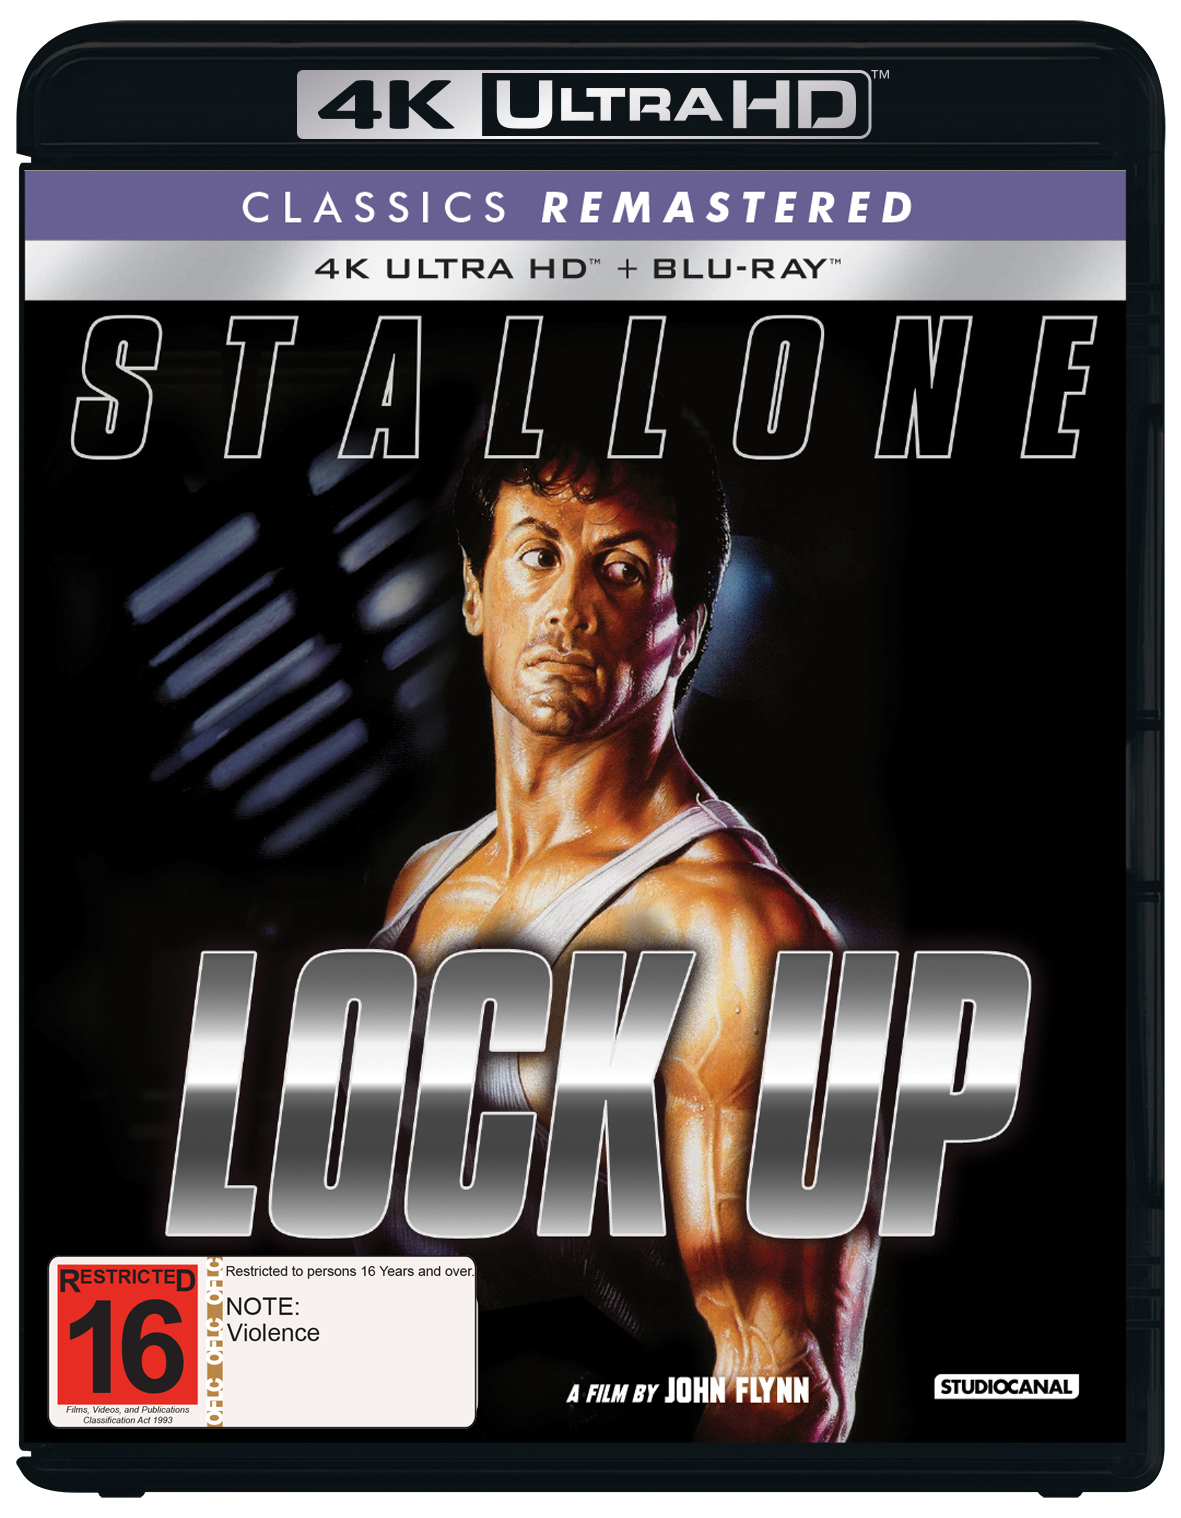 Lock Up on Blu-ray, UHD Blu-ray image